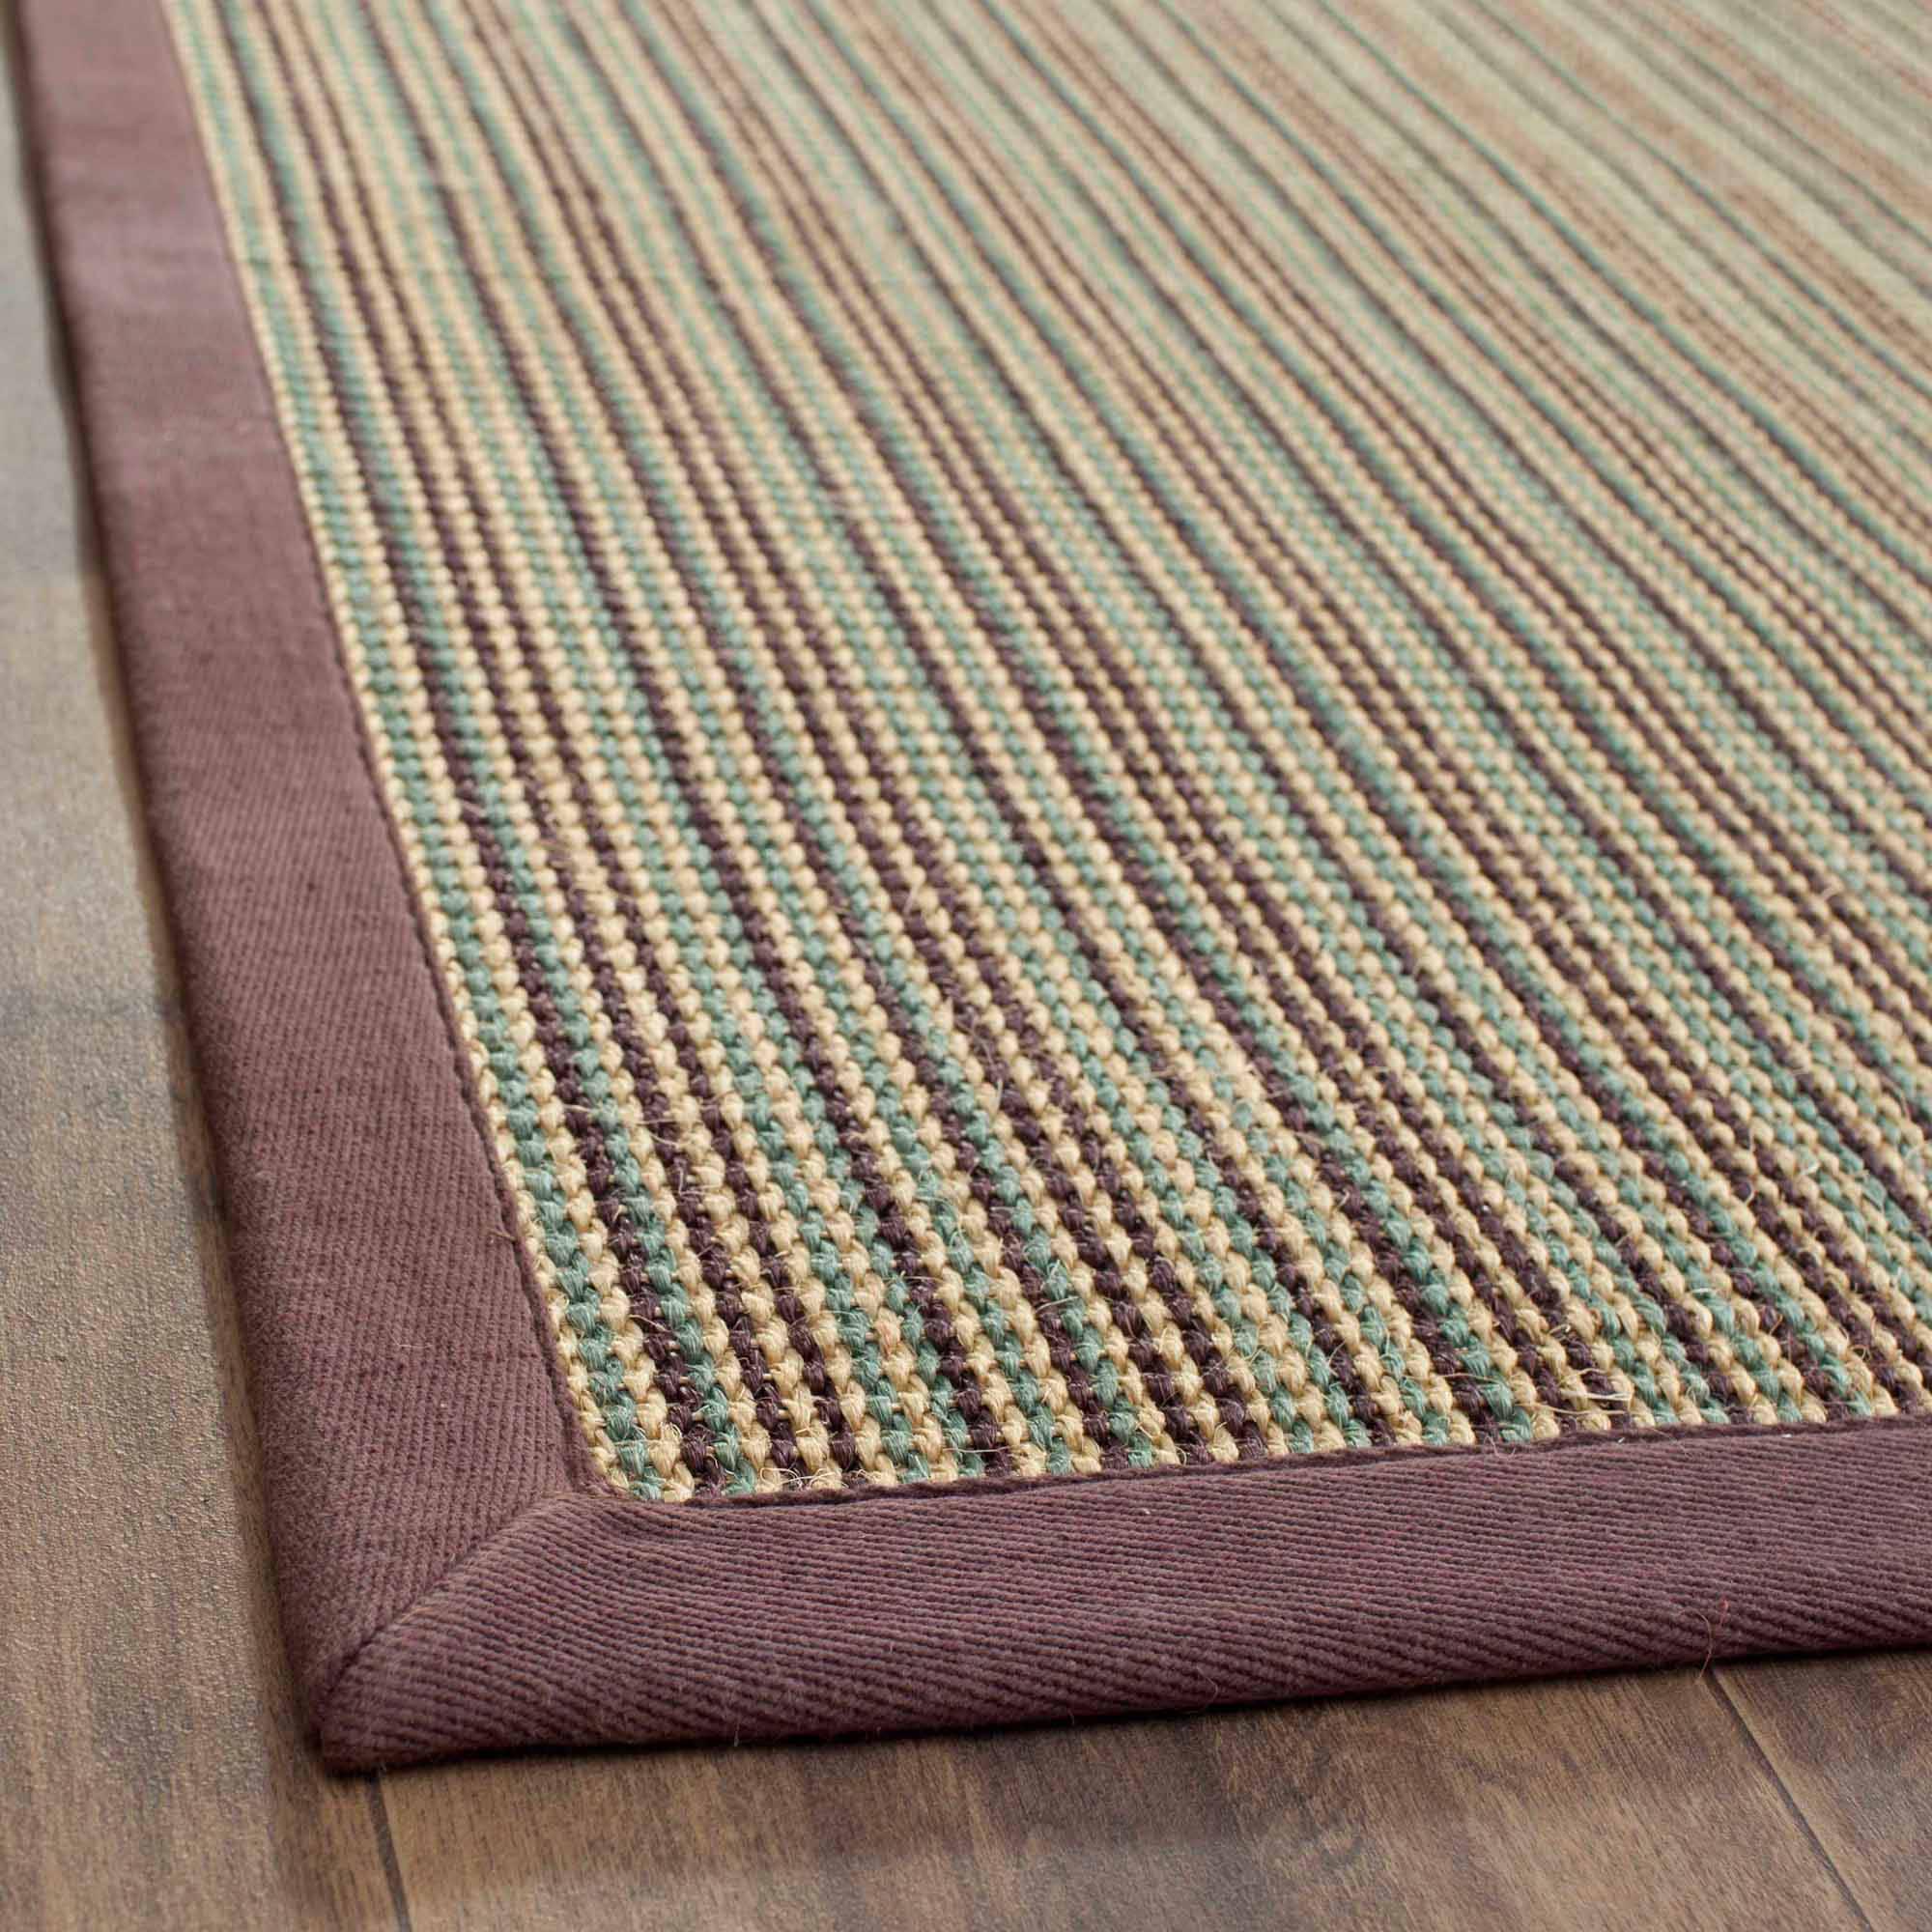 Safavieh Natural Fiber Rectangular Area Rug, Blue and Purple